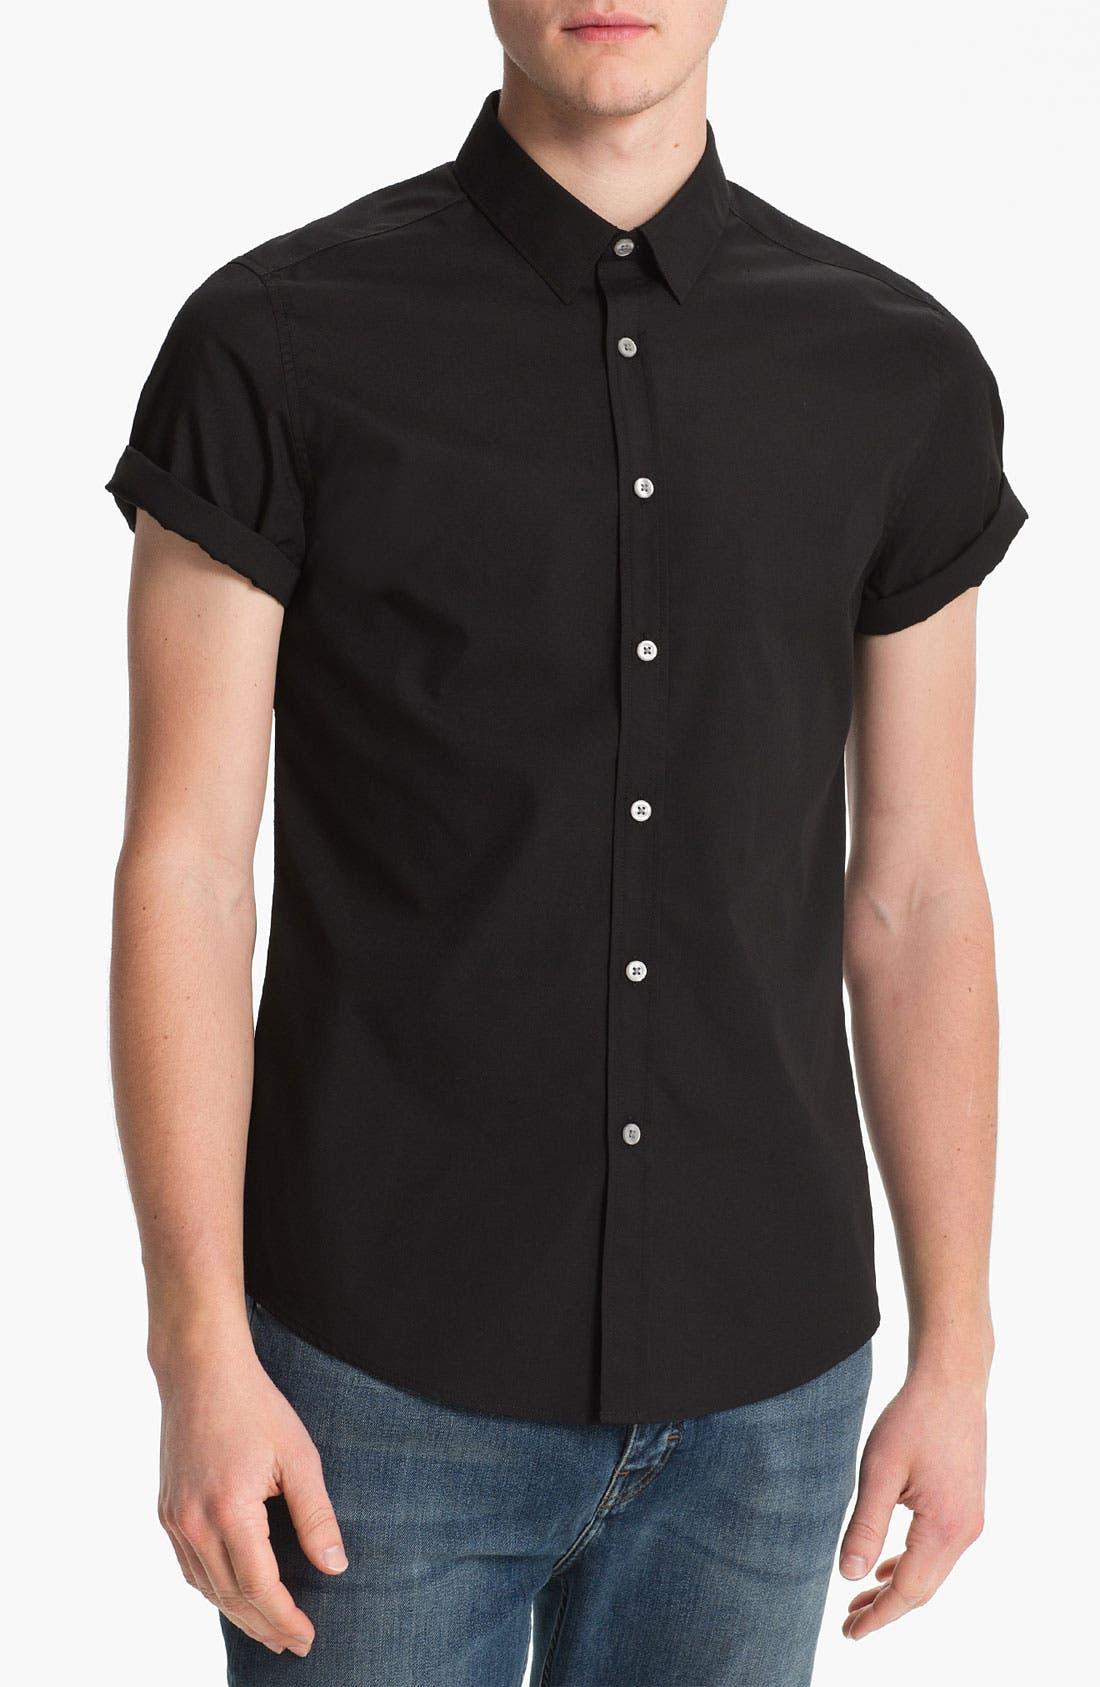 Alternate Image 1 Selected - Topman 'Smart' Short Sleeve Shirt